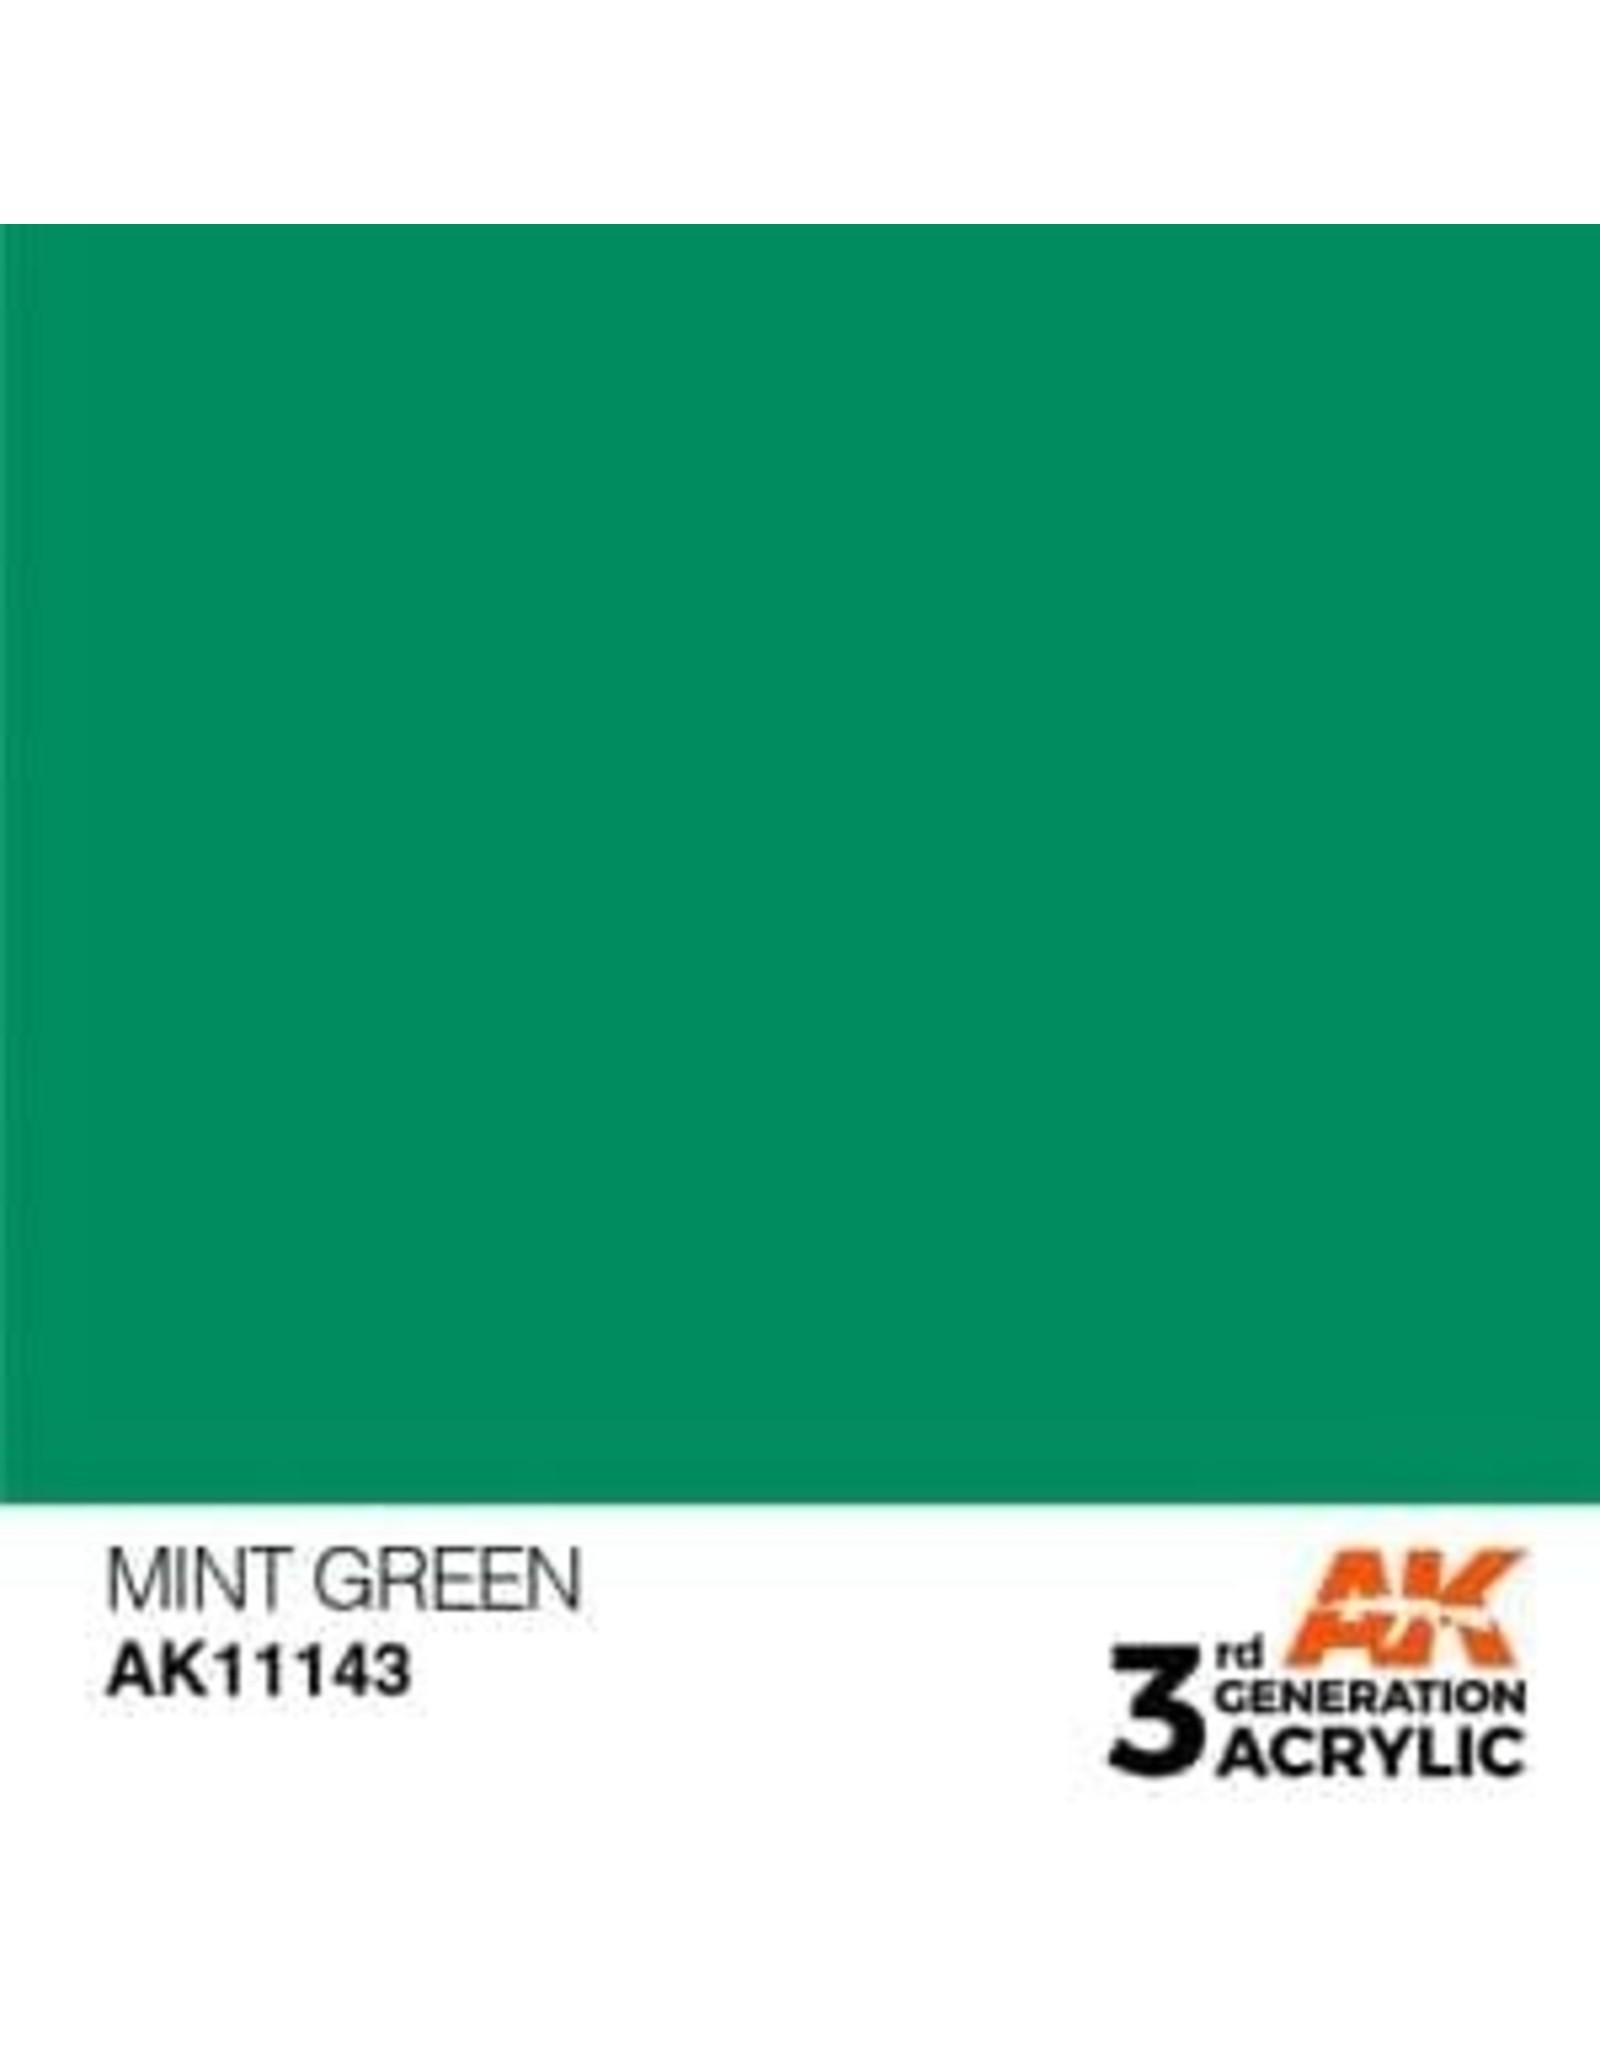 AK Interactive 3RD GEN ACRYLIC MINT GREEN 17ML